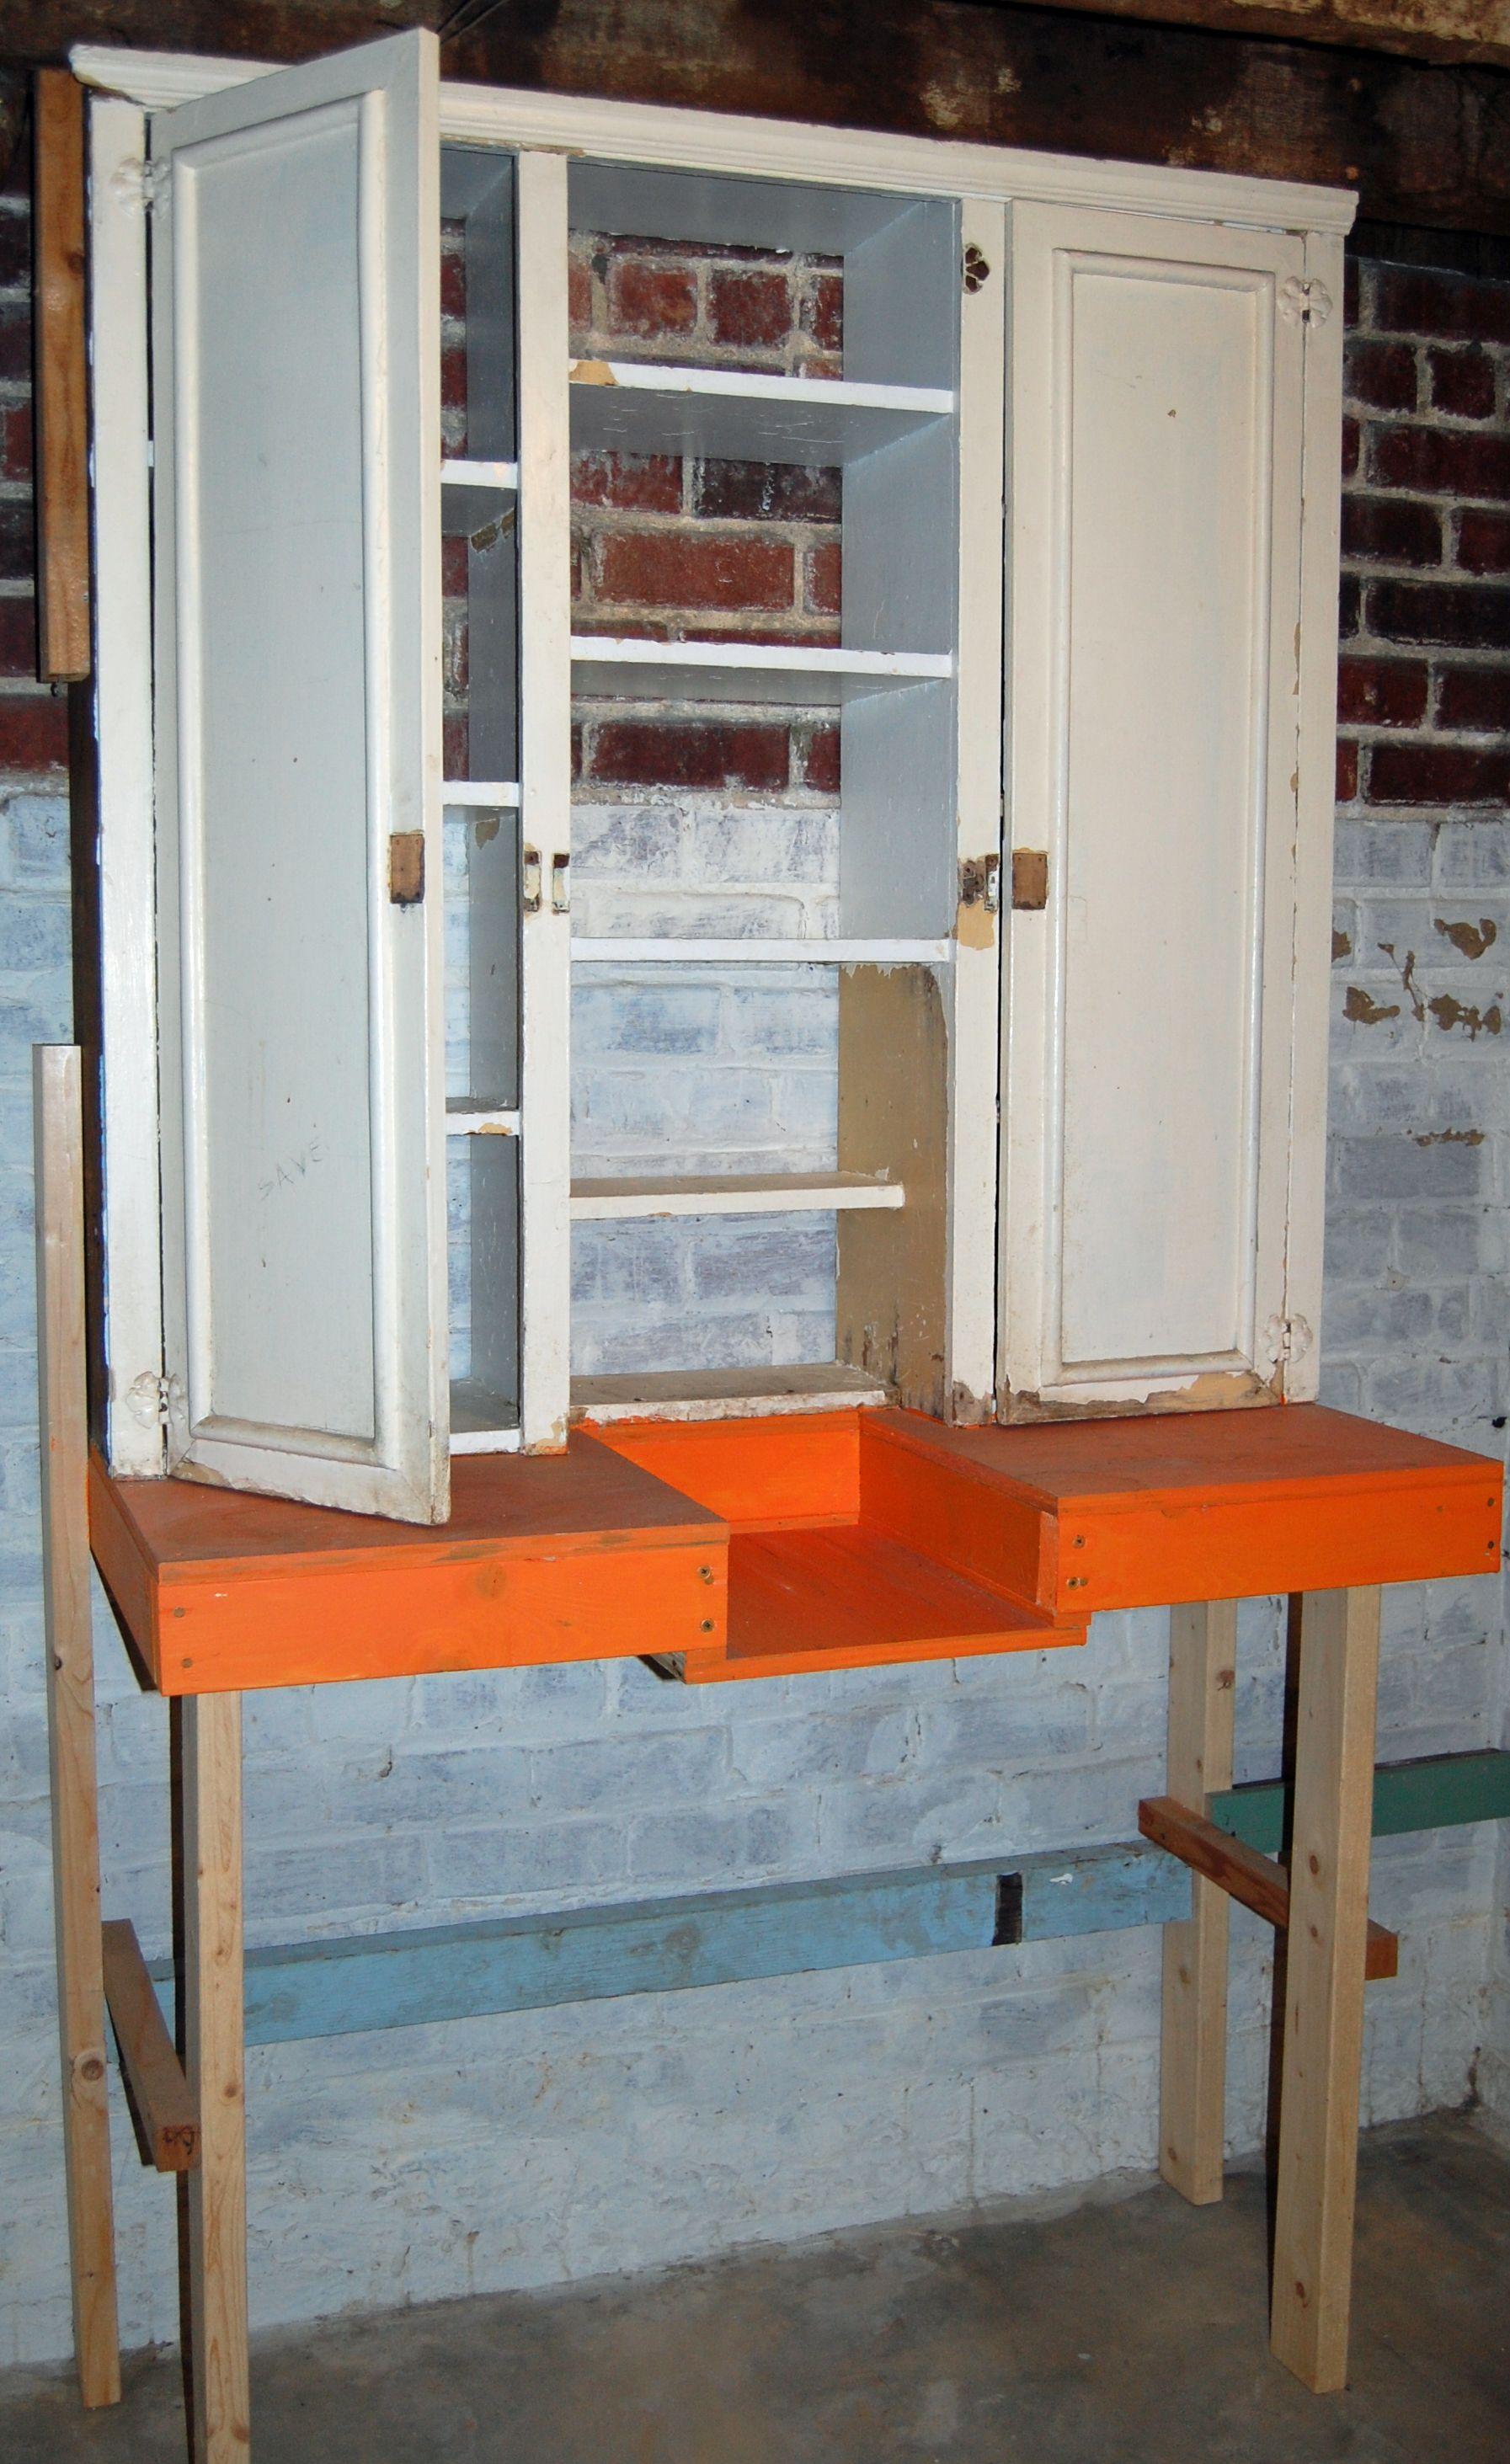 Repurposed Potting Bench Restore Potting Bench Repurposed Old Kitchen Cabinets